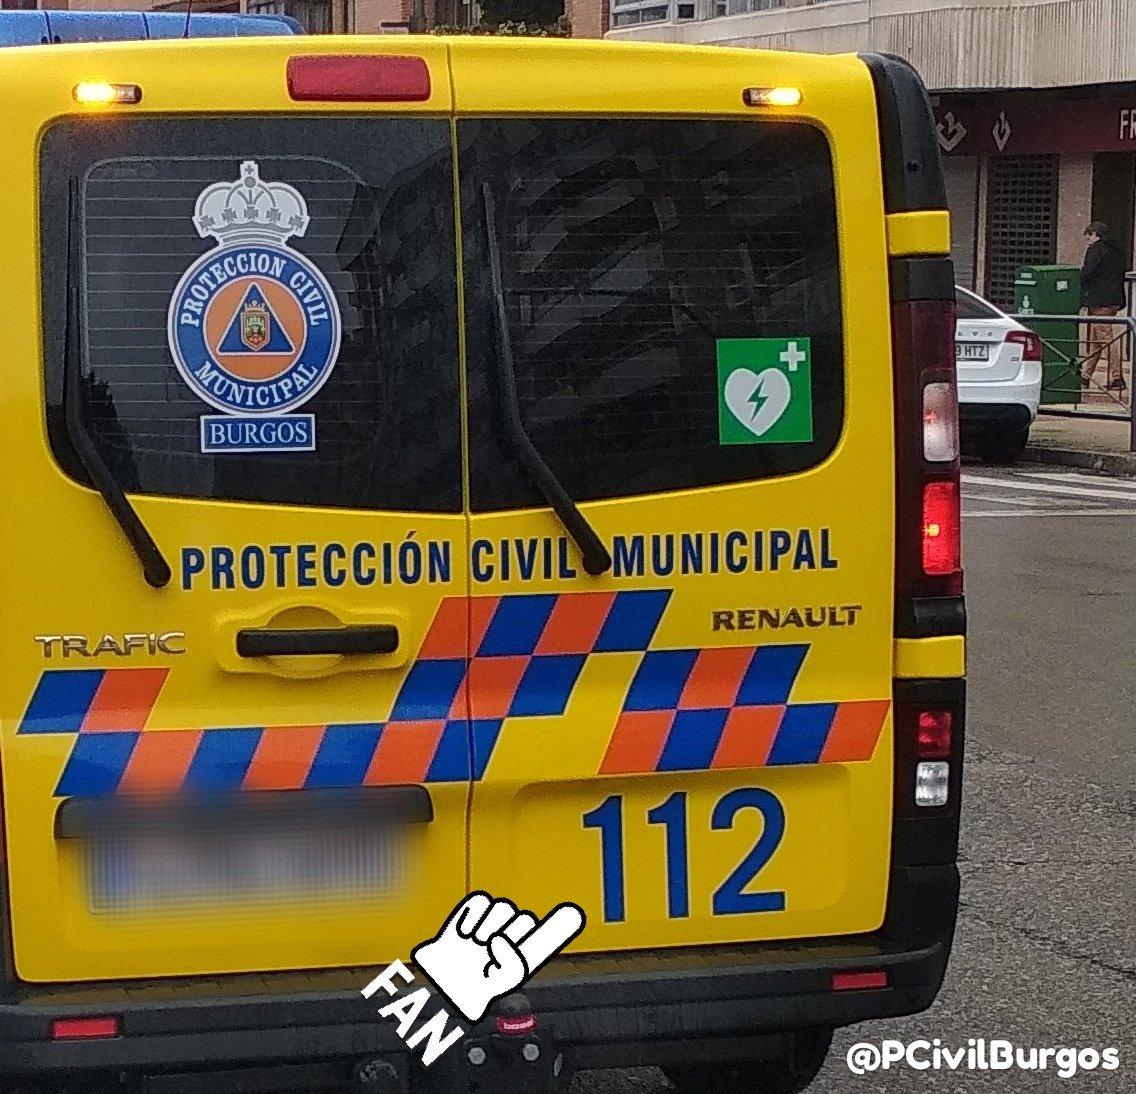 P.Civil Burgos's photo on #DiaEuropeo112